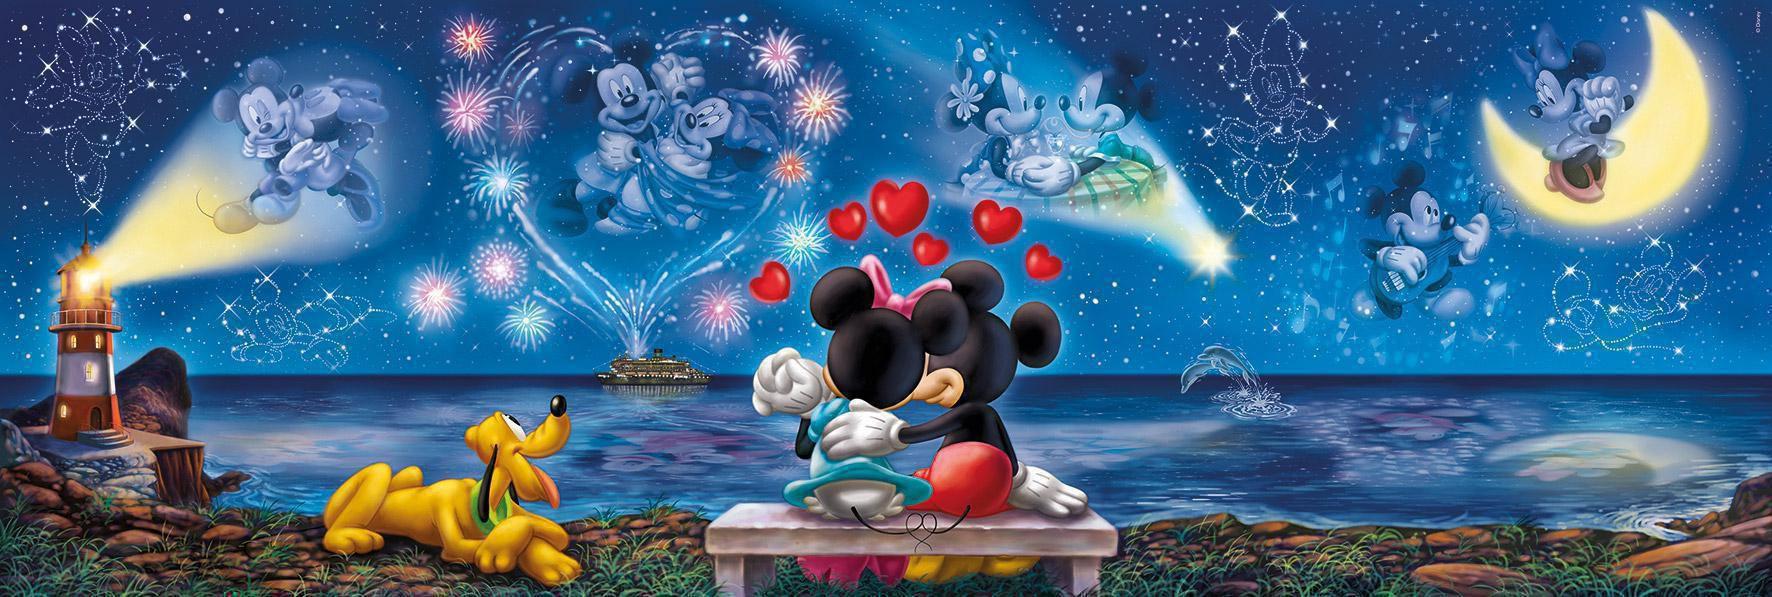 mickey mouse kissen